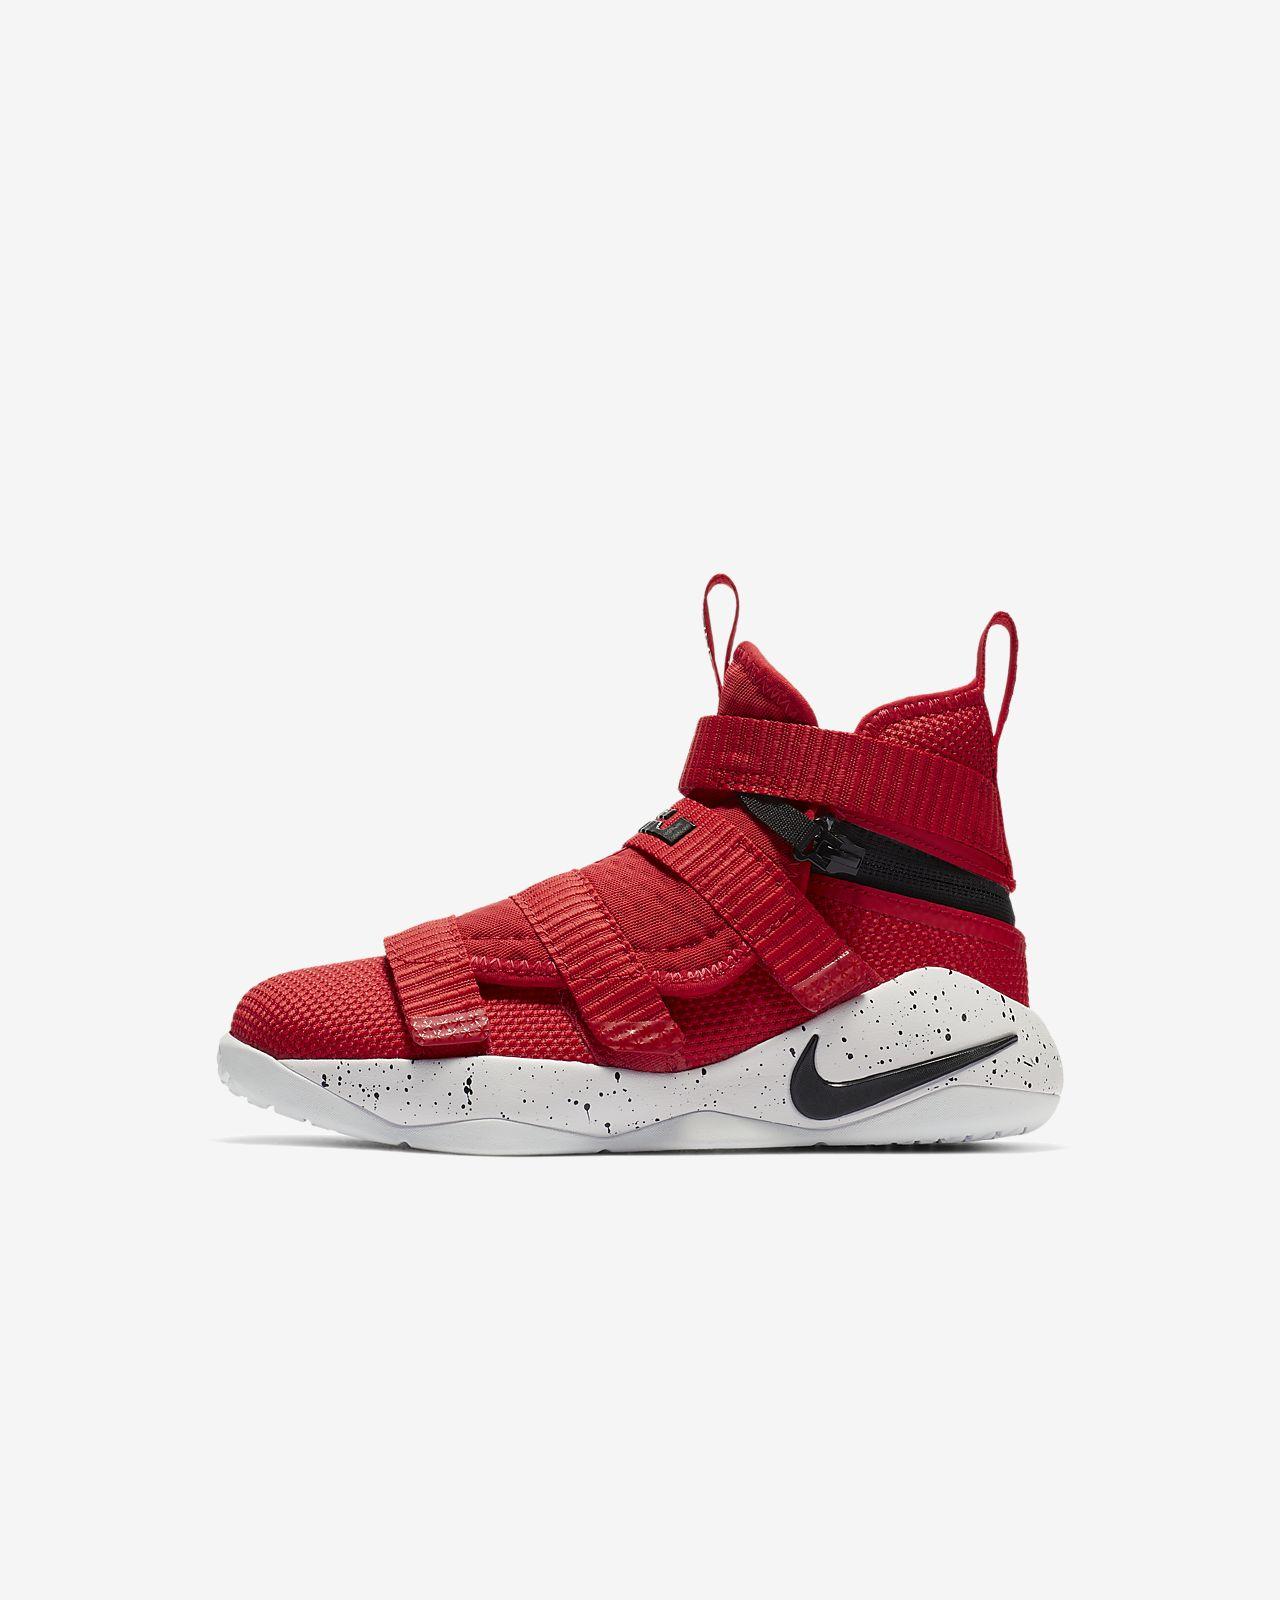 1222b3097e3d2 LeBron Soldier 11 FlyEase Little Kids  Shoe. Nike.com